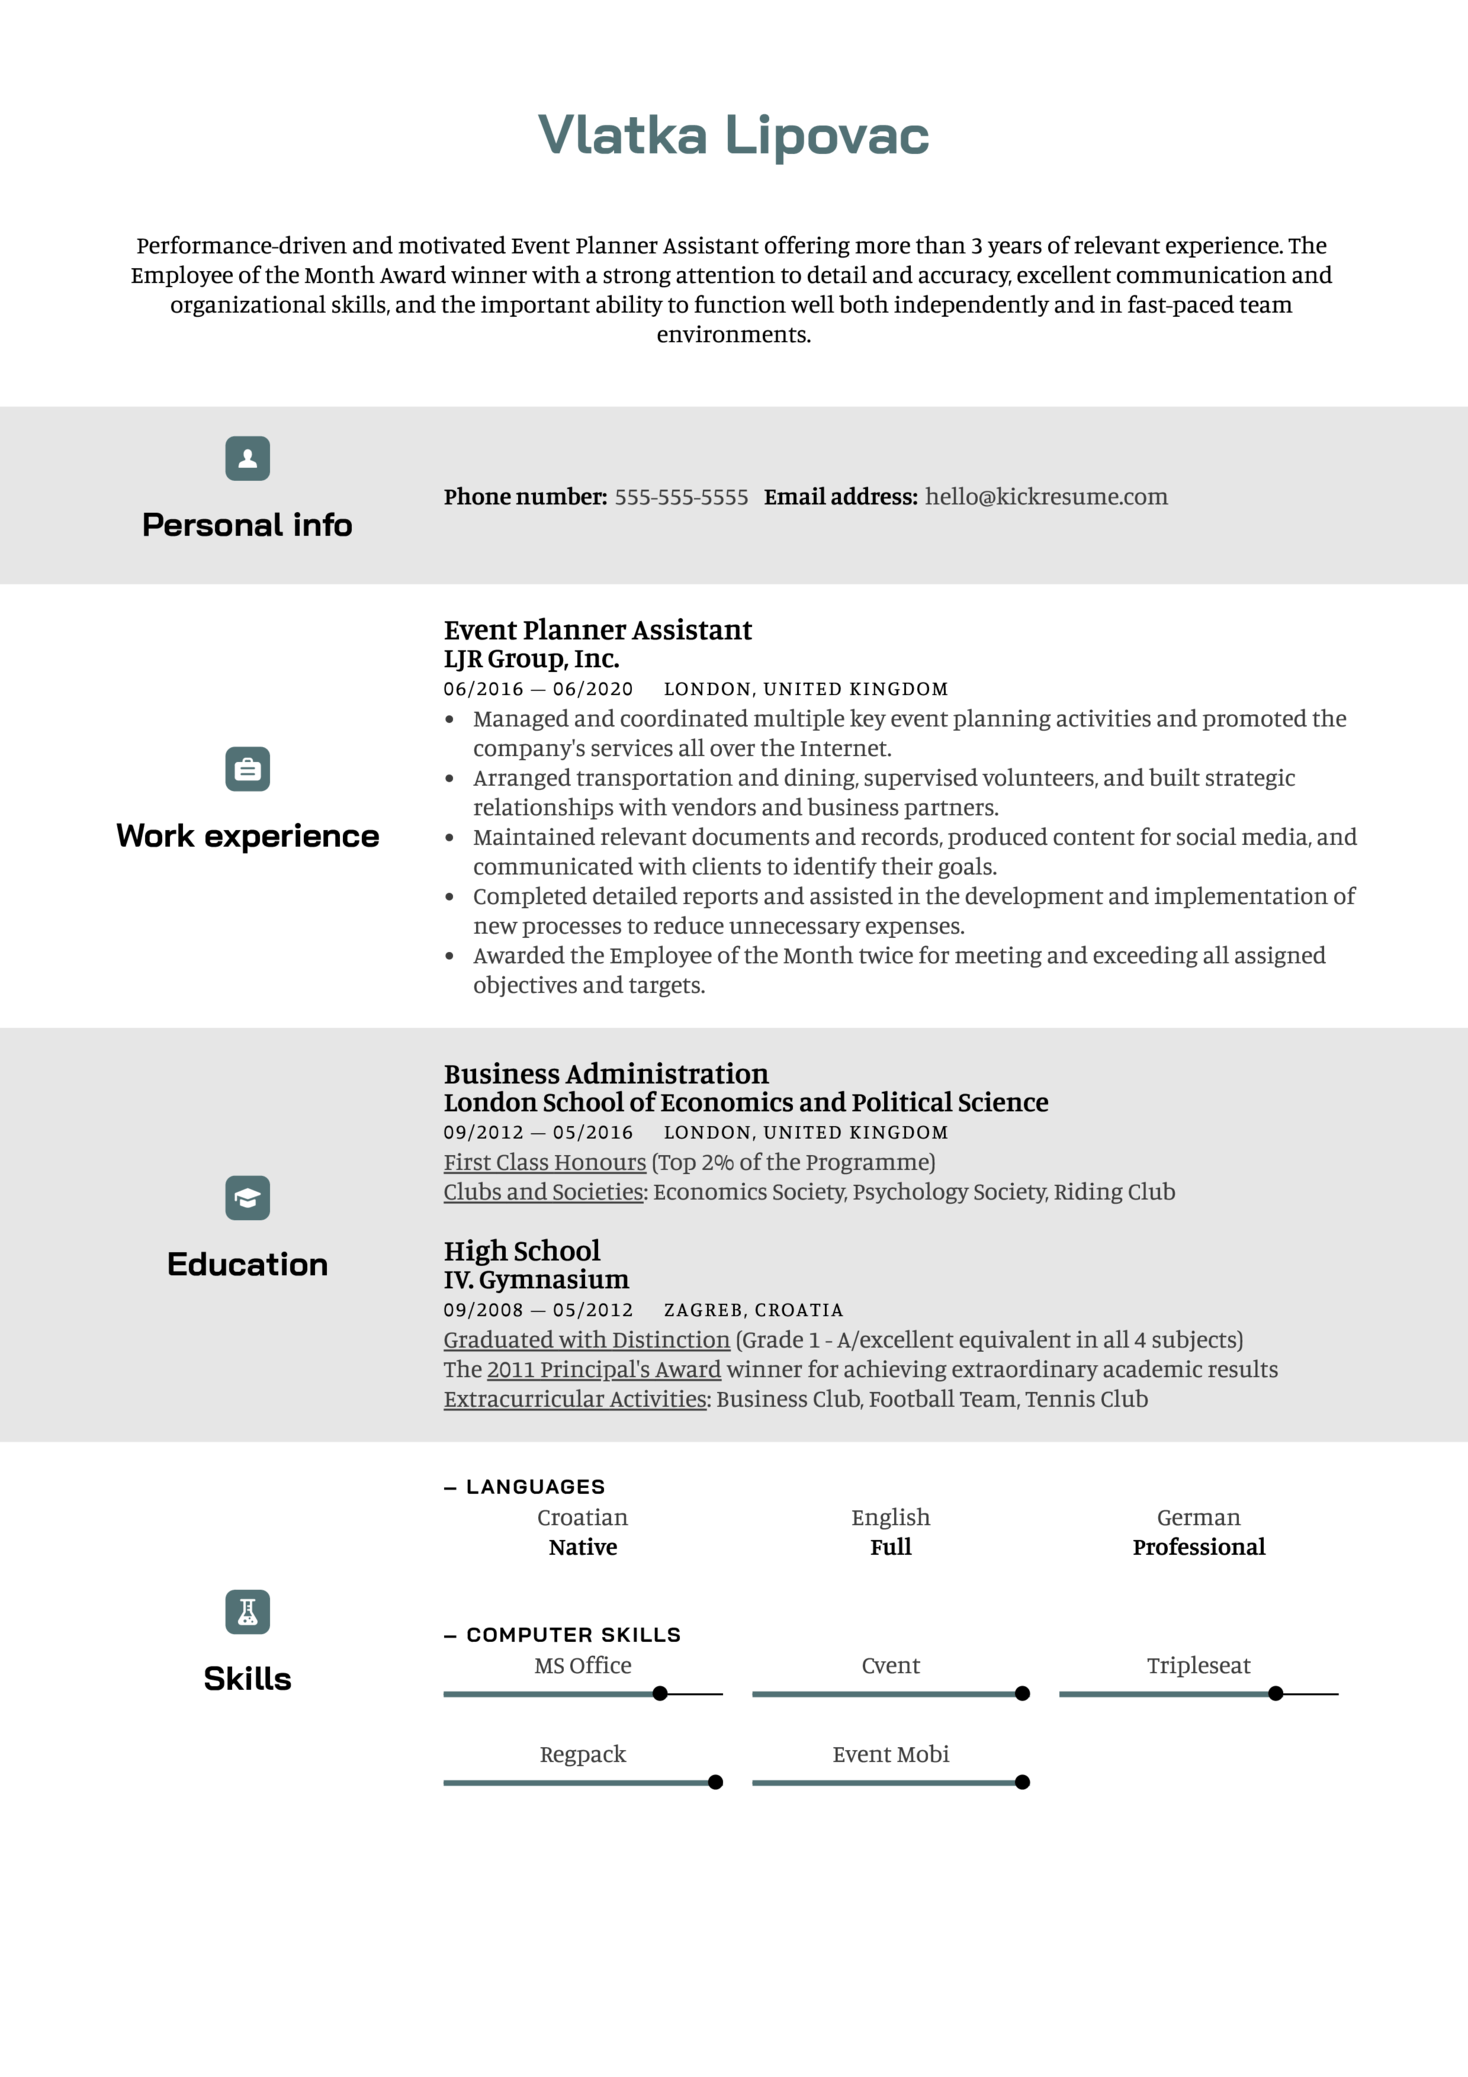 Event Planner Assistant Resume Sample (parte 1)